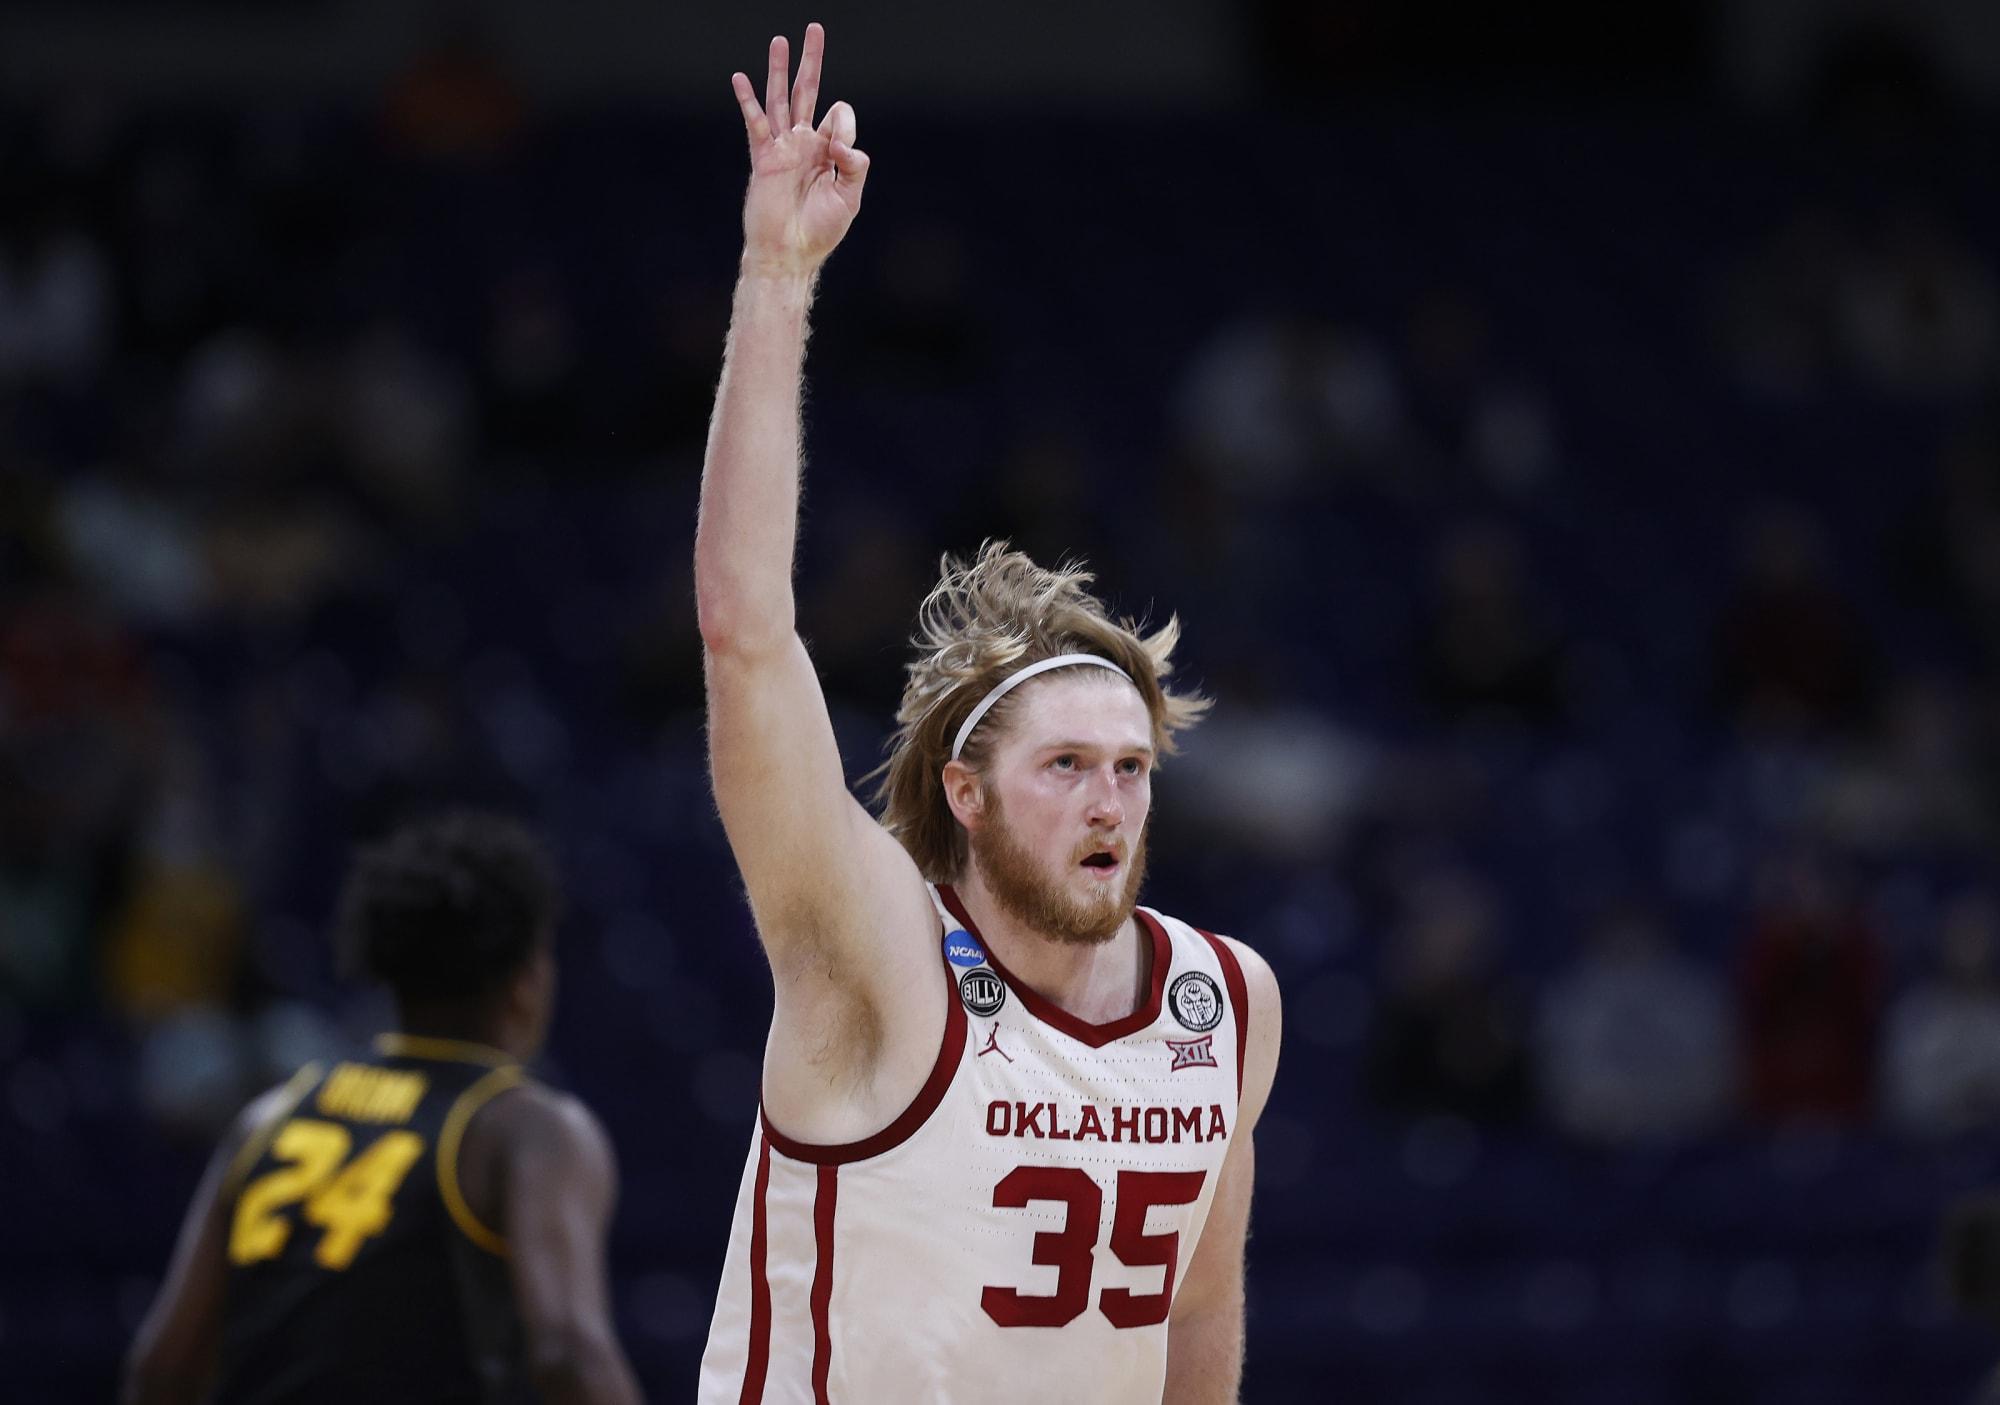 UNC Basketball: Tar Heels land former Oklahoma forward